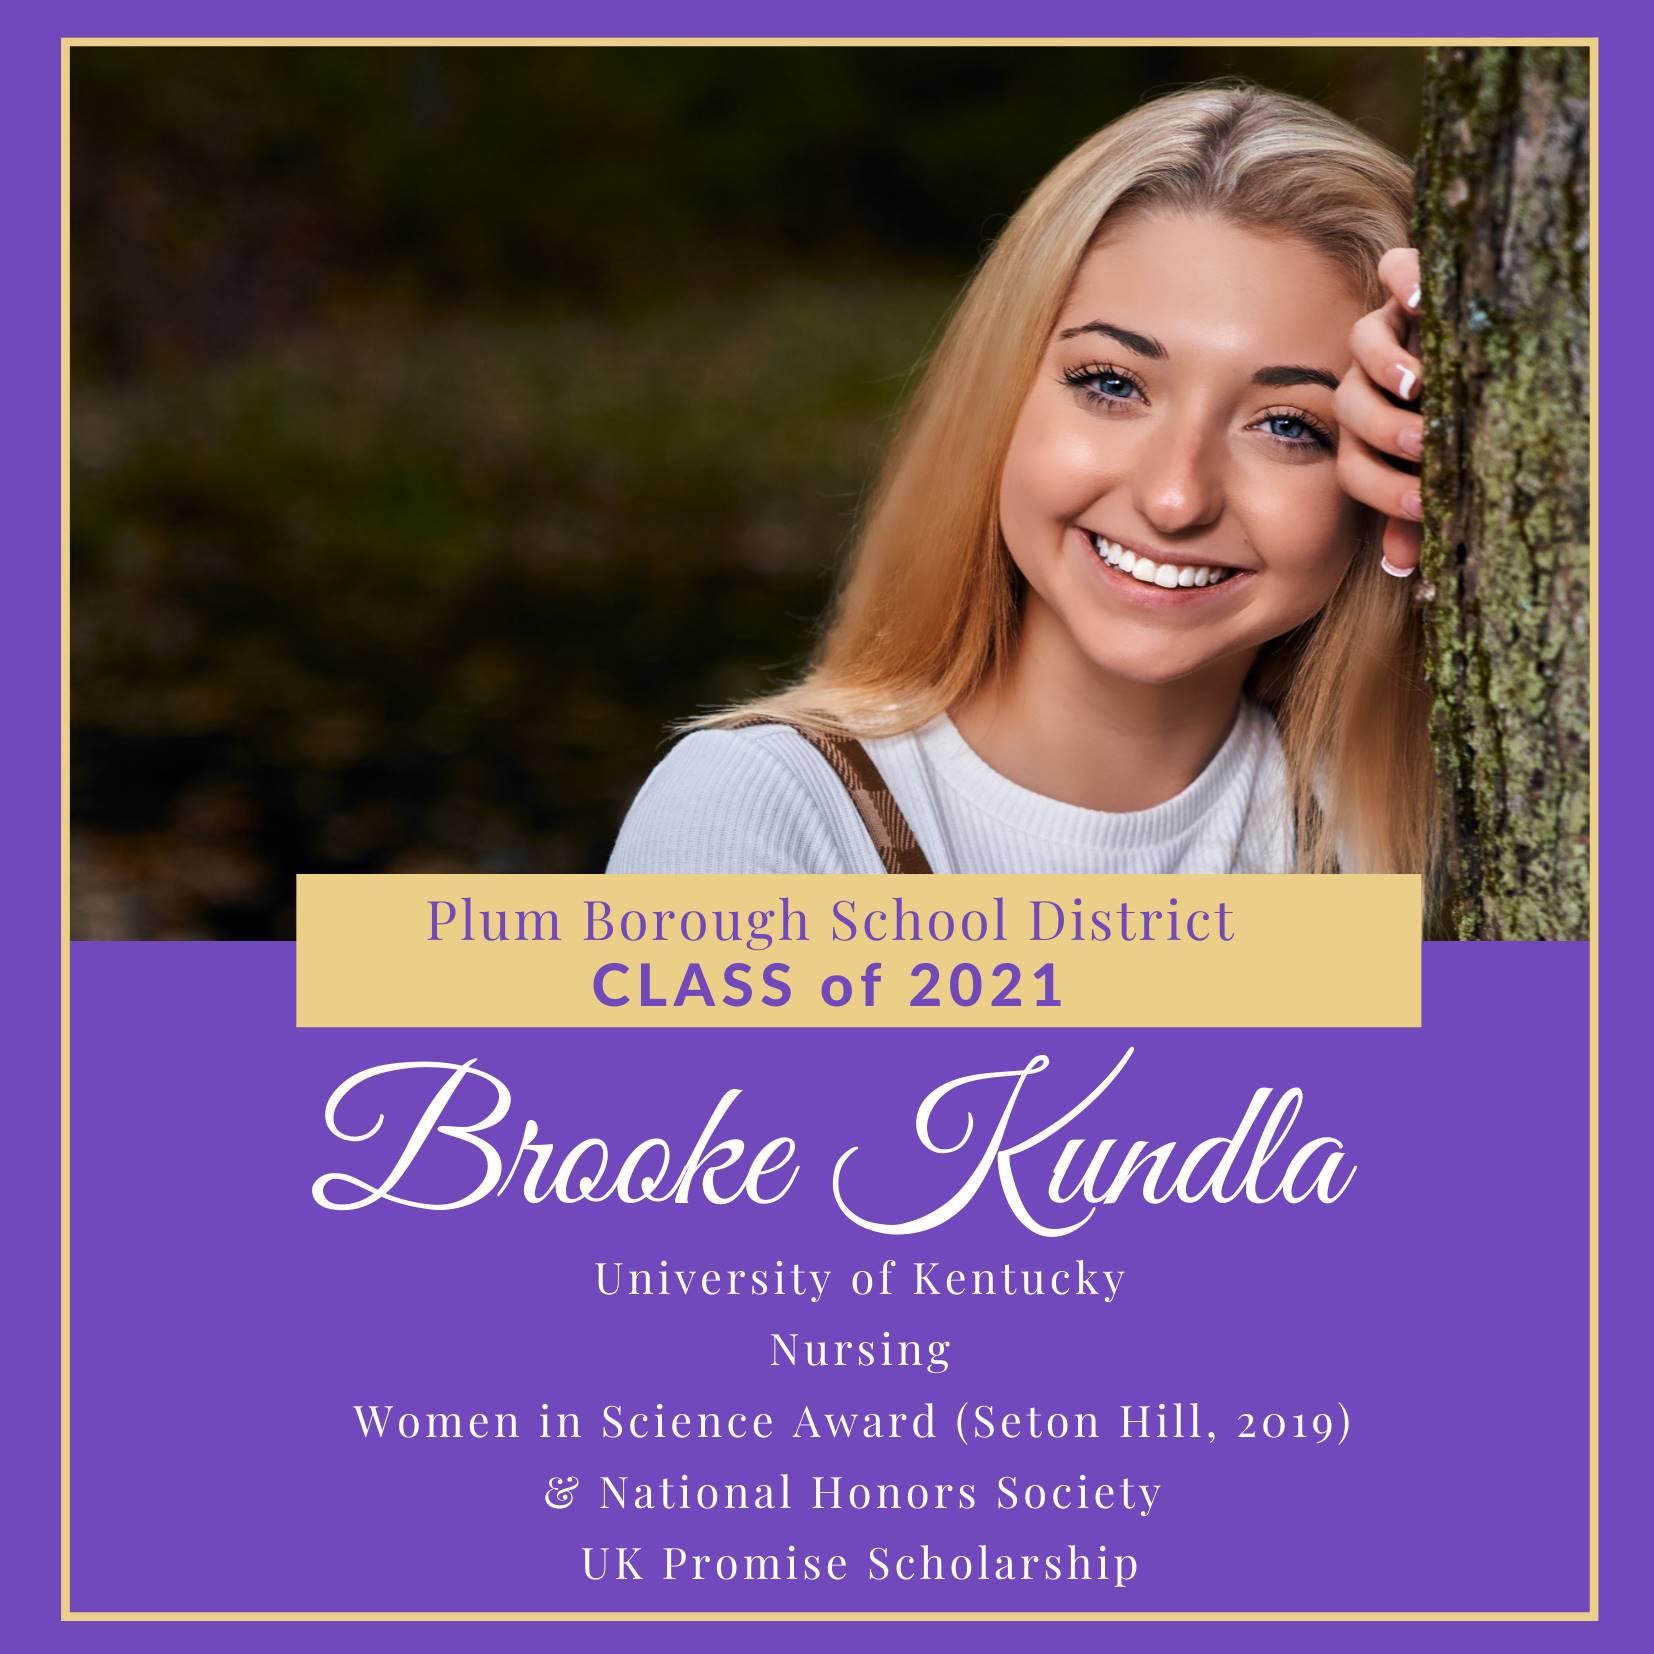 Congratulations to Brooke Kundla, Class of 2021!